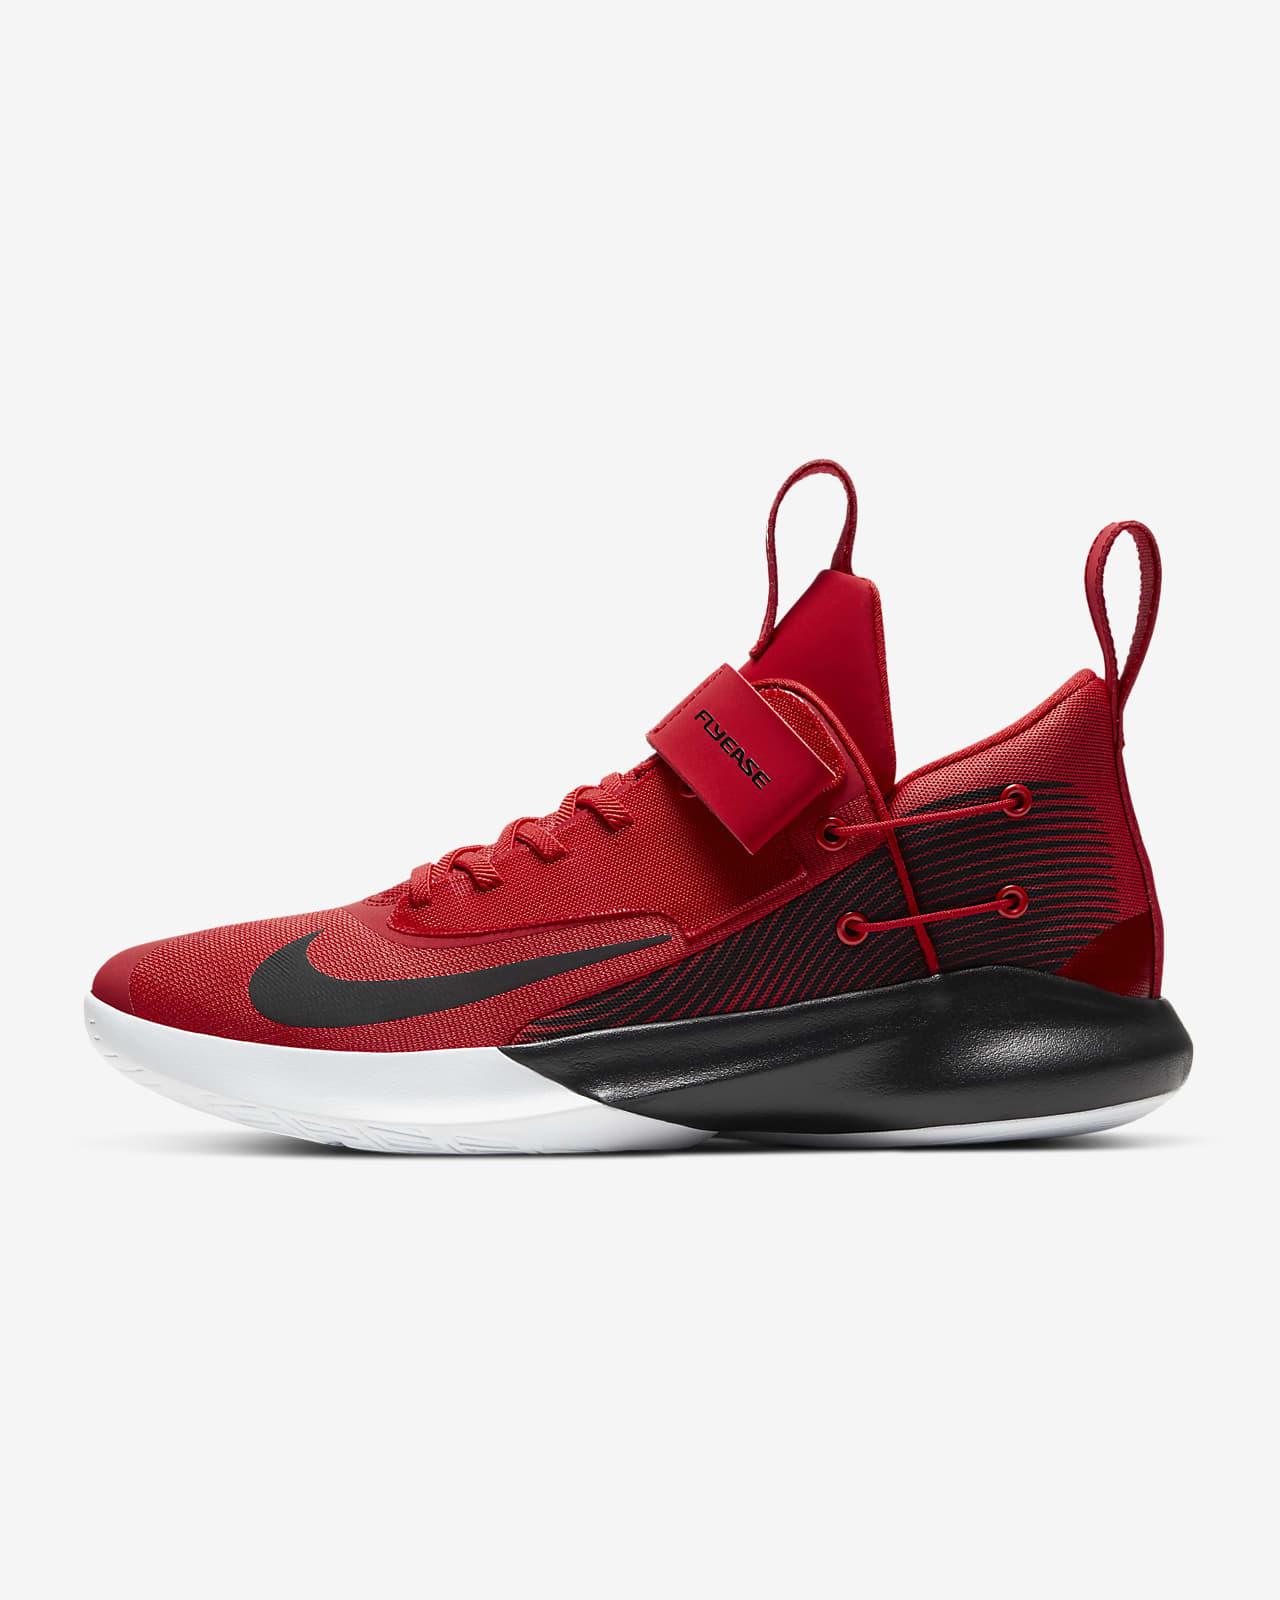 Nike Precision 4 FlyEase Basketball Shoe